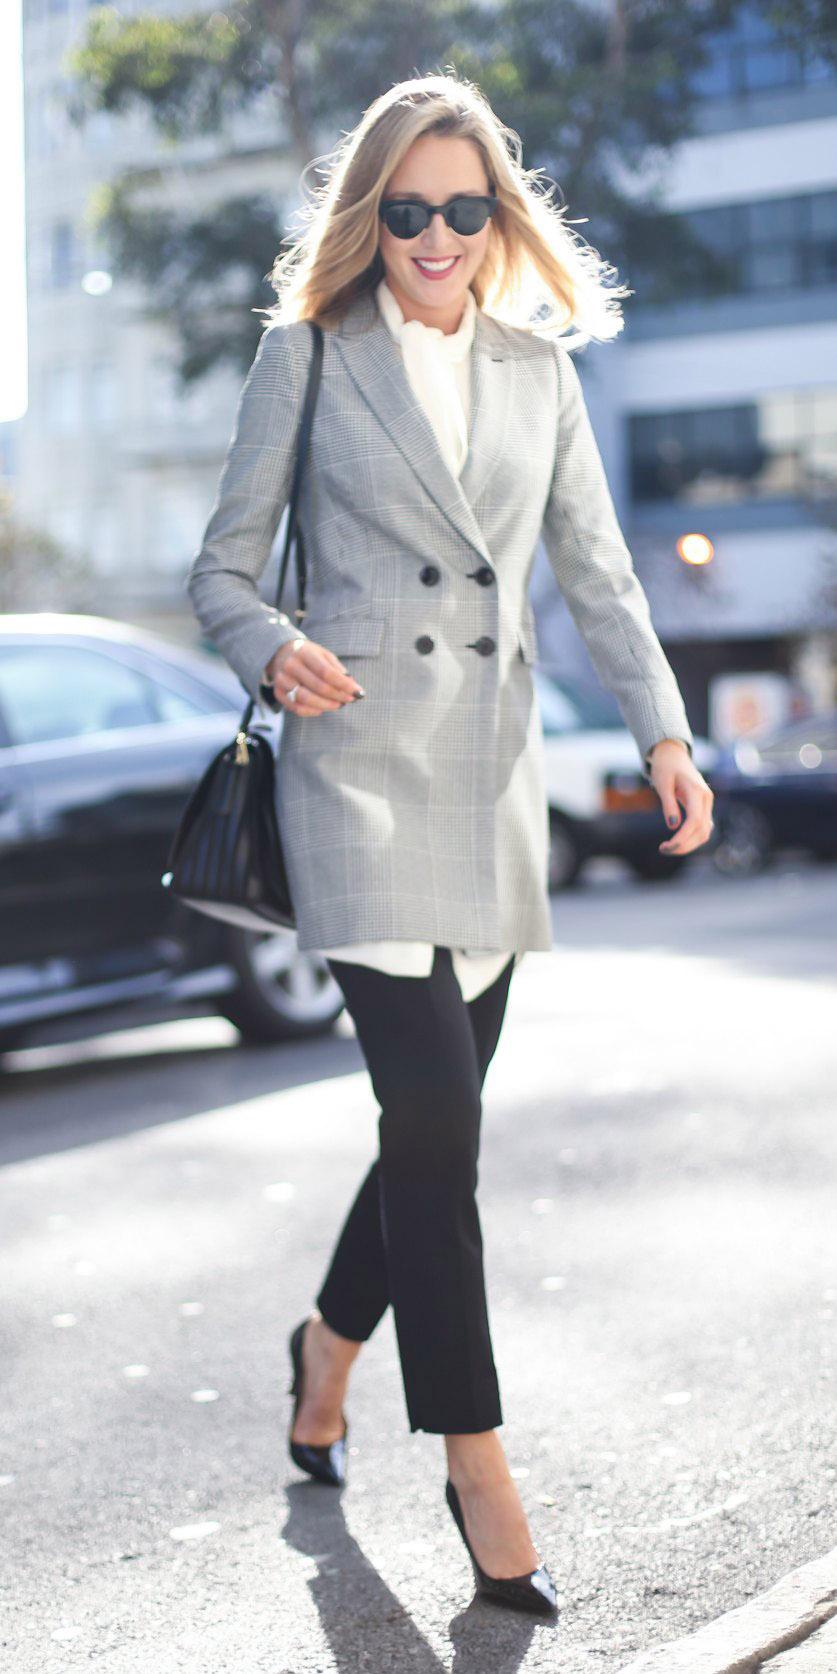 black-slim-pants-black-shoe-pumps-black-bag-grayl-jacket-blazer-boyfriend-fall-winter-blonde-work.jpg